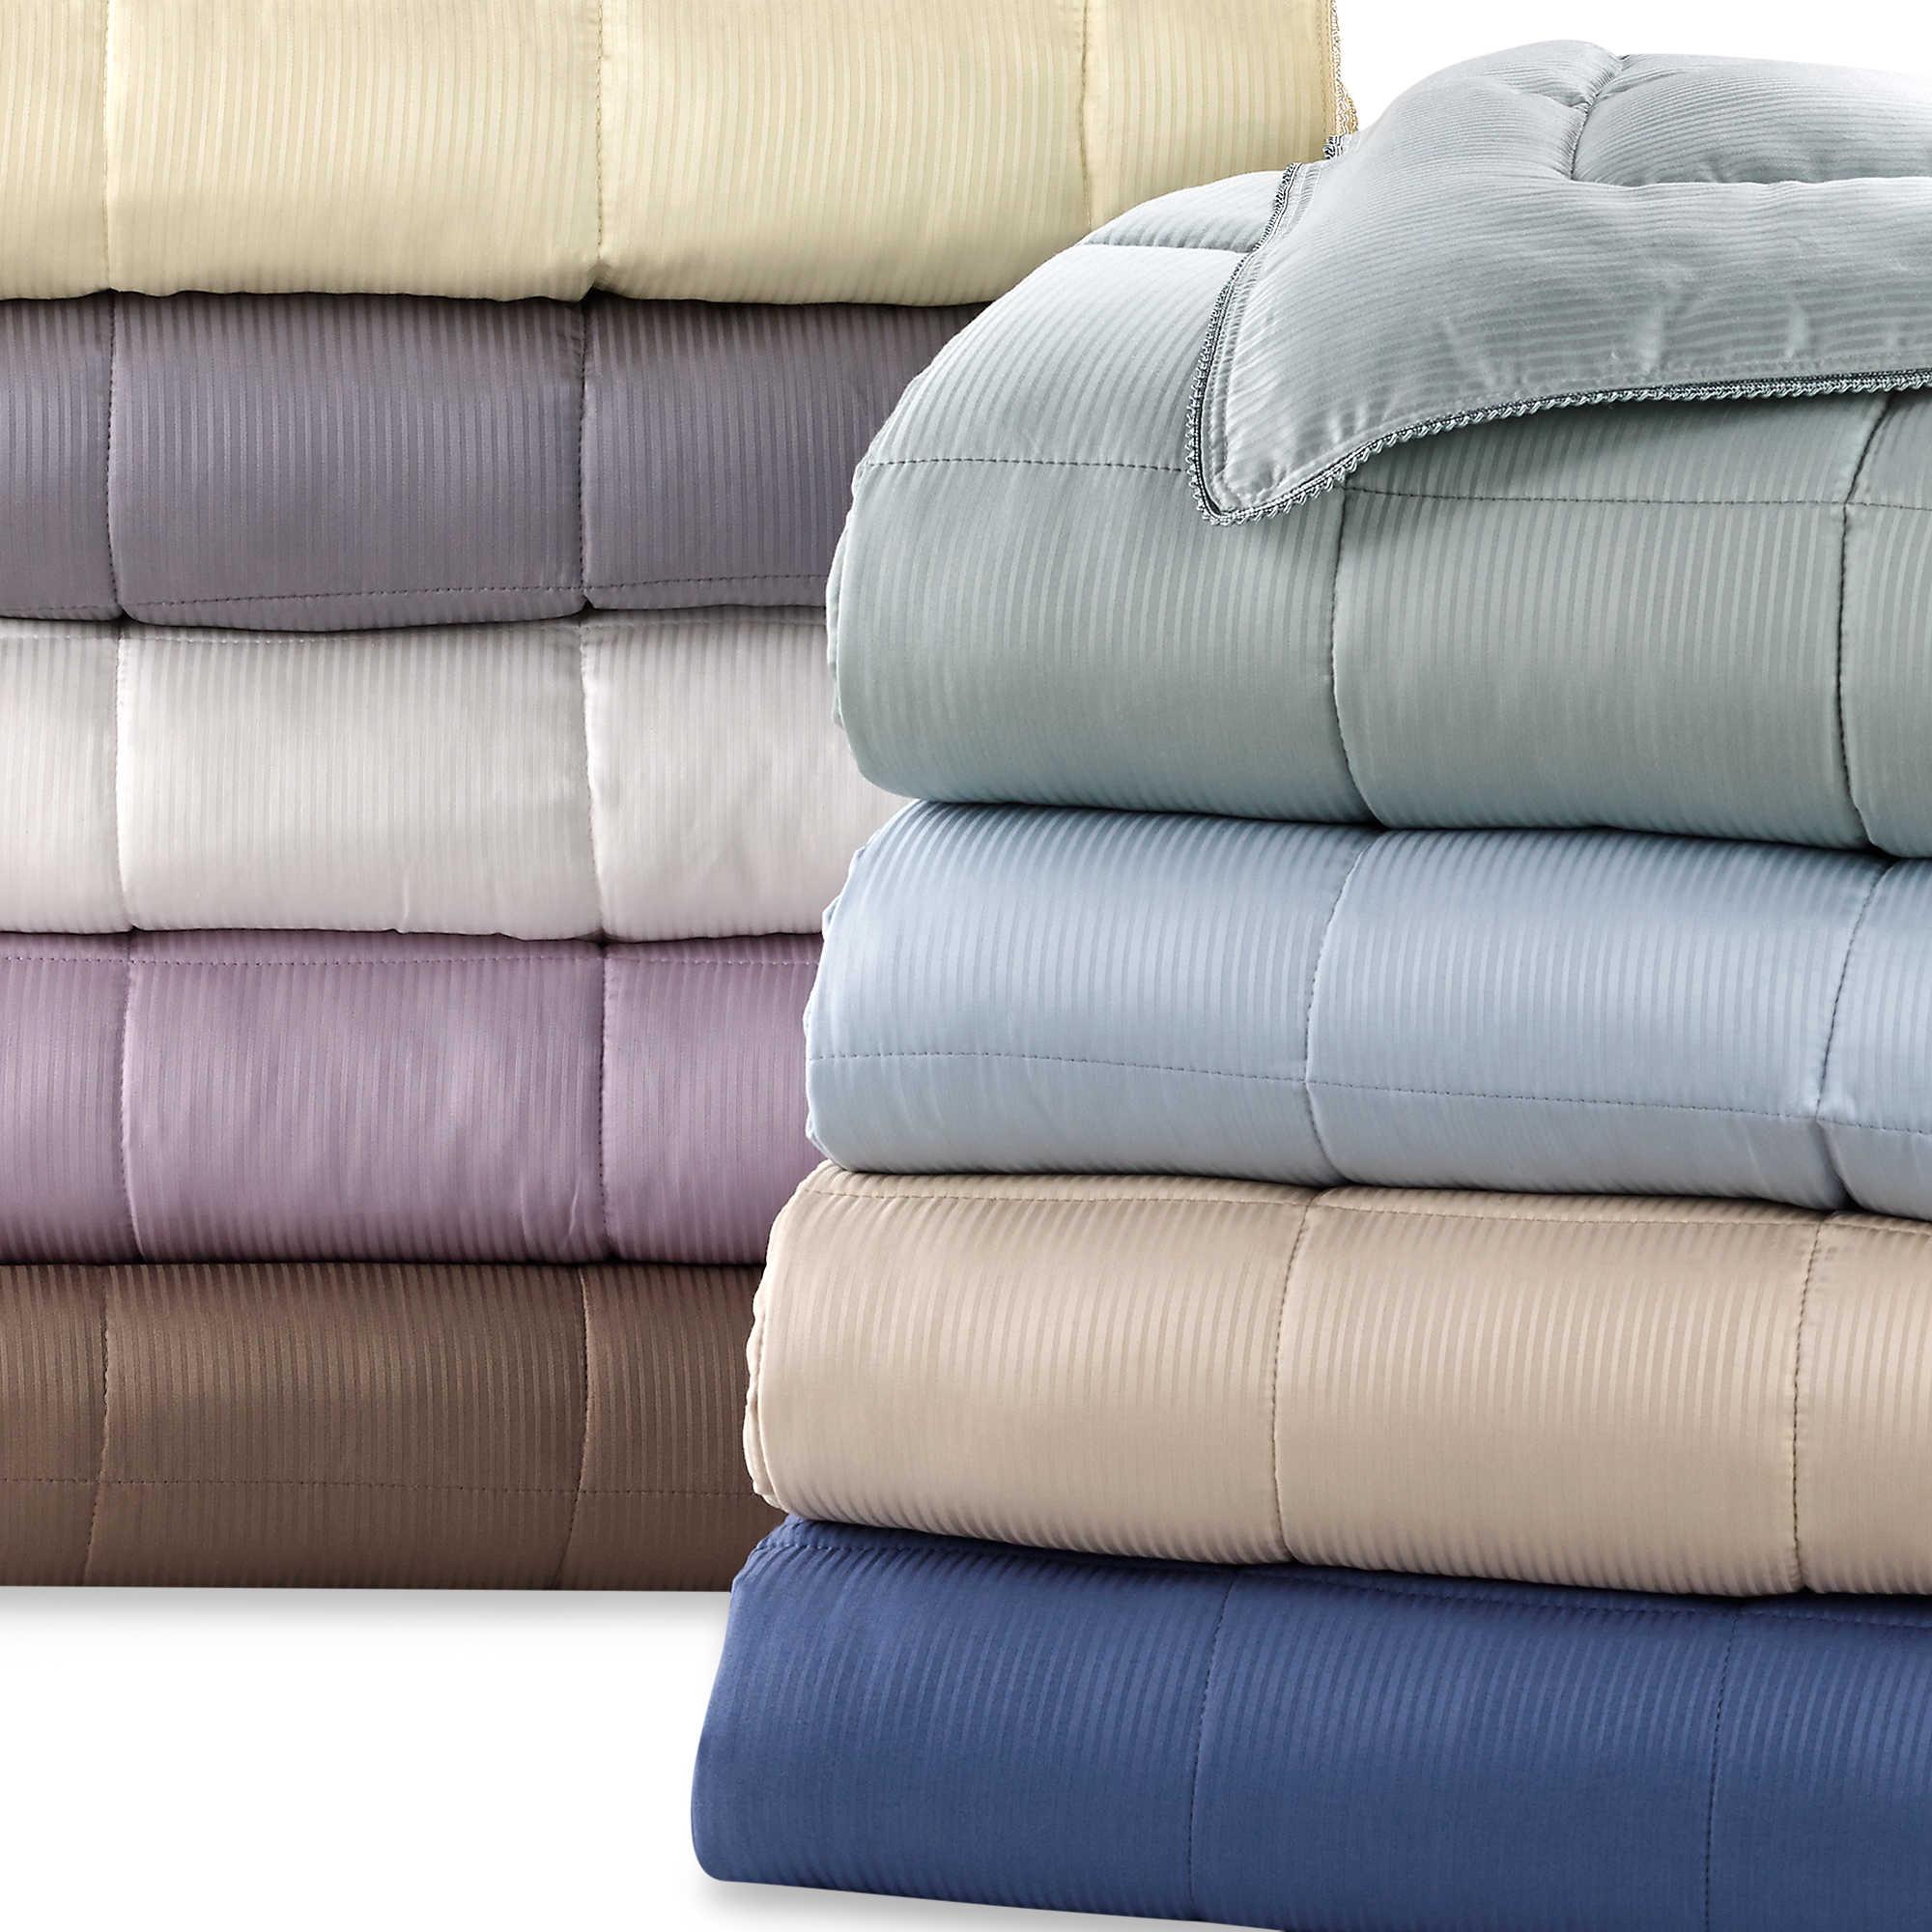 Uncategorized britannica home fashions tencel sheets - Eucalyptus Origins Trade Tencel Reg Lyocell Cover Down Alternative Blanket